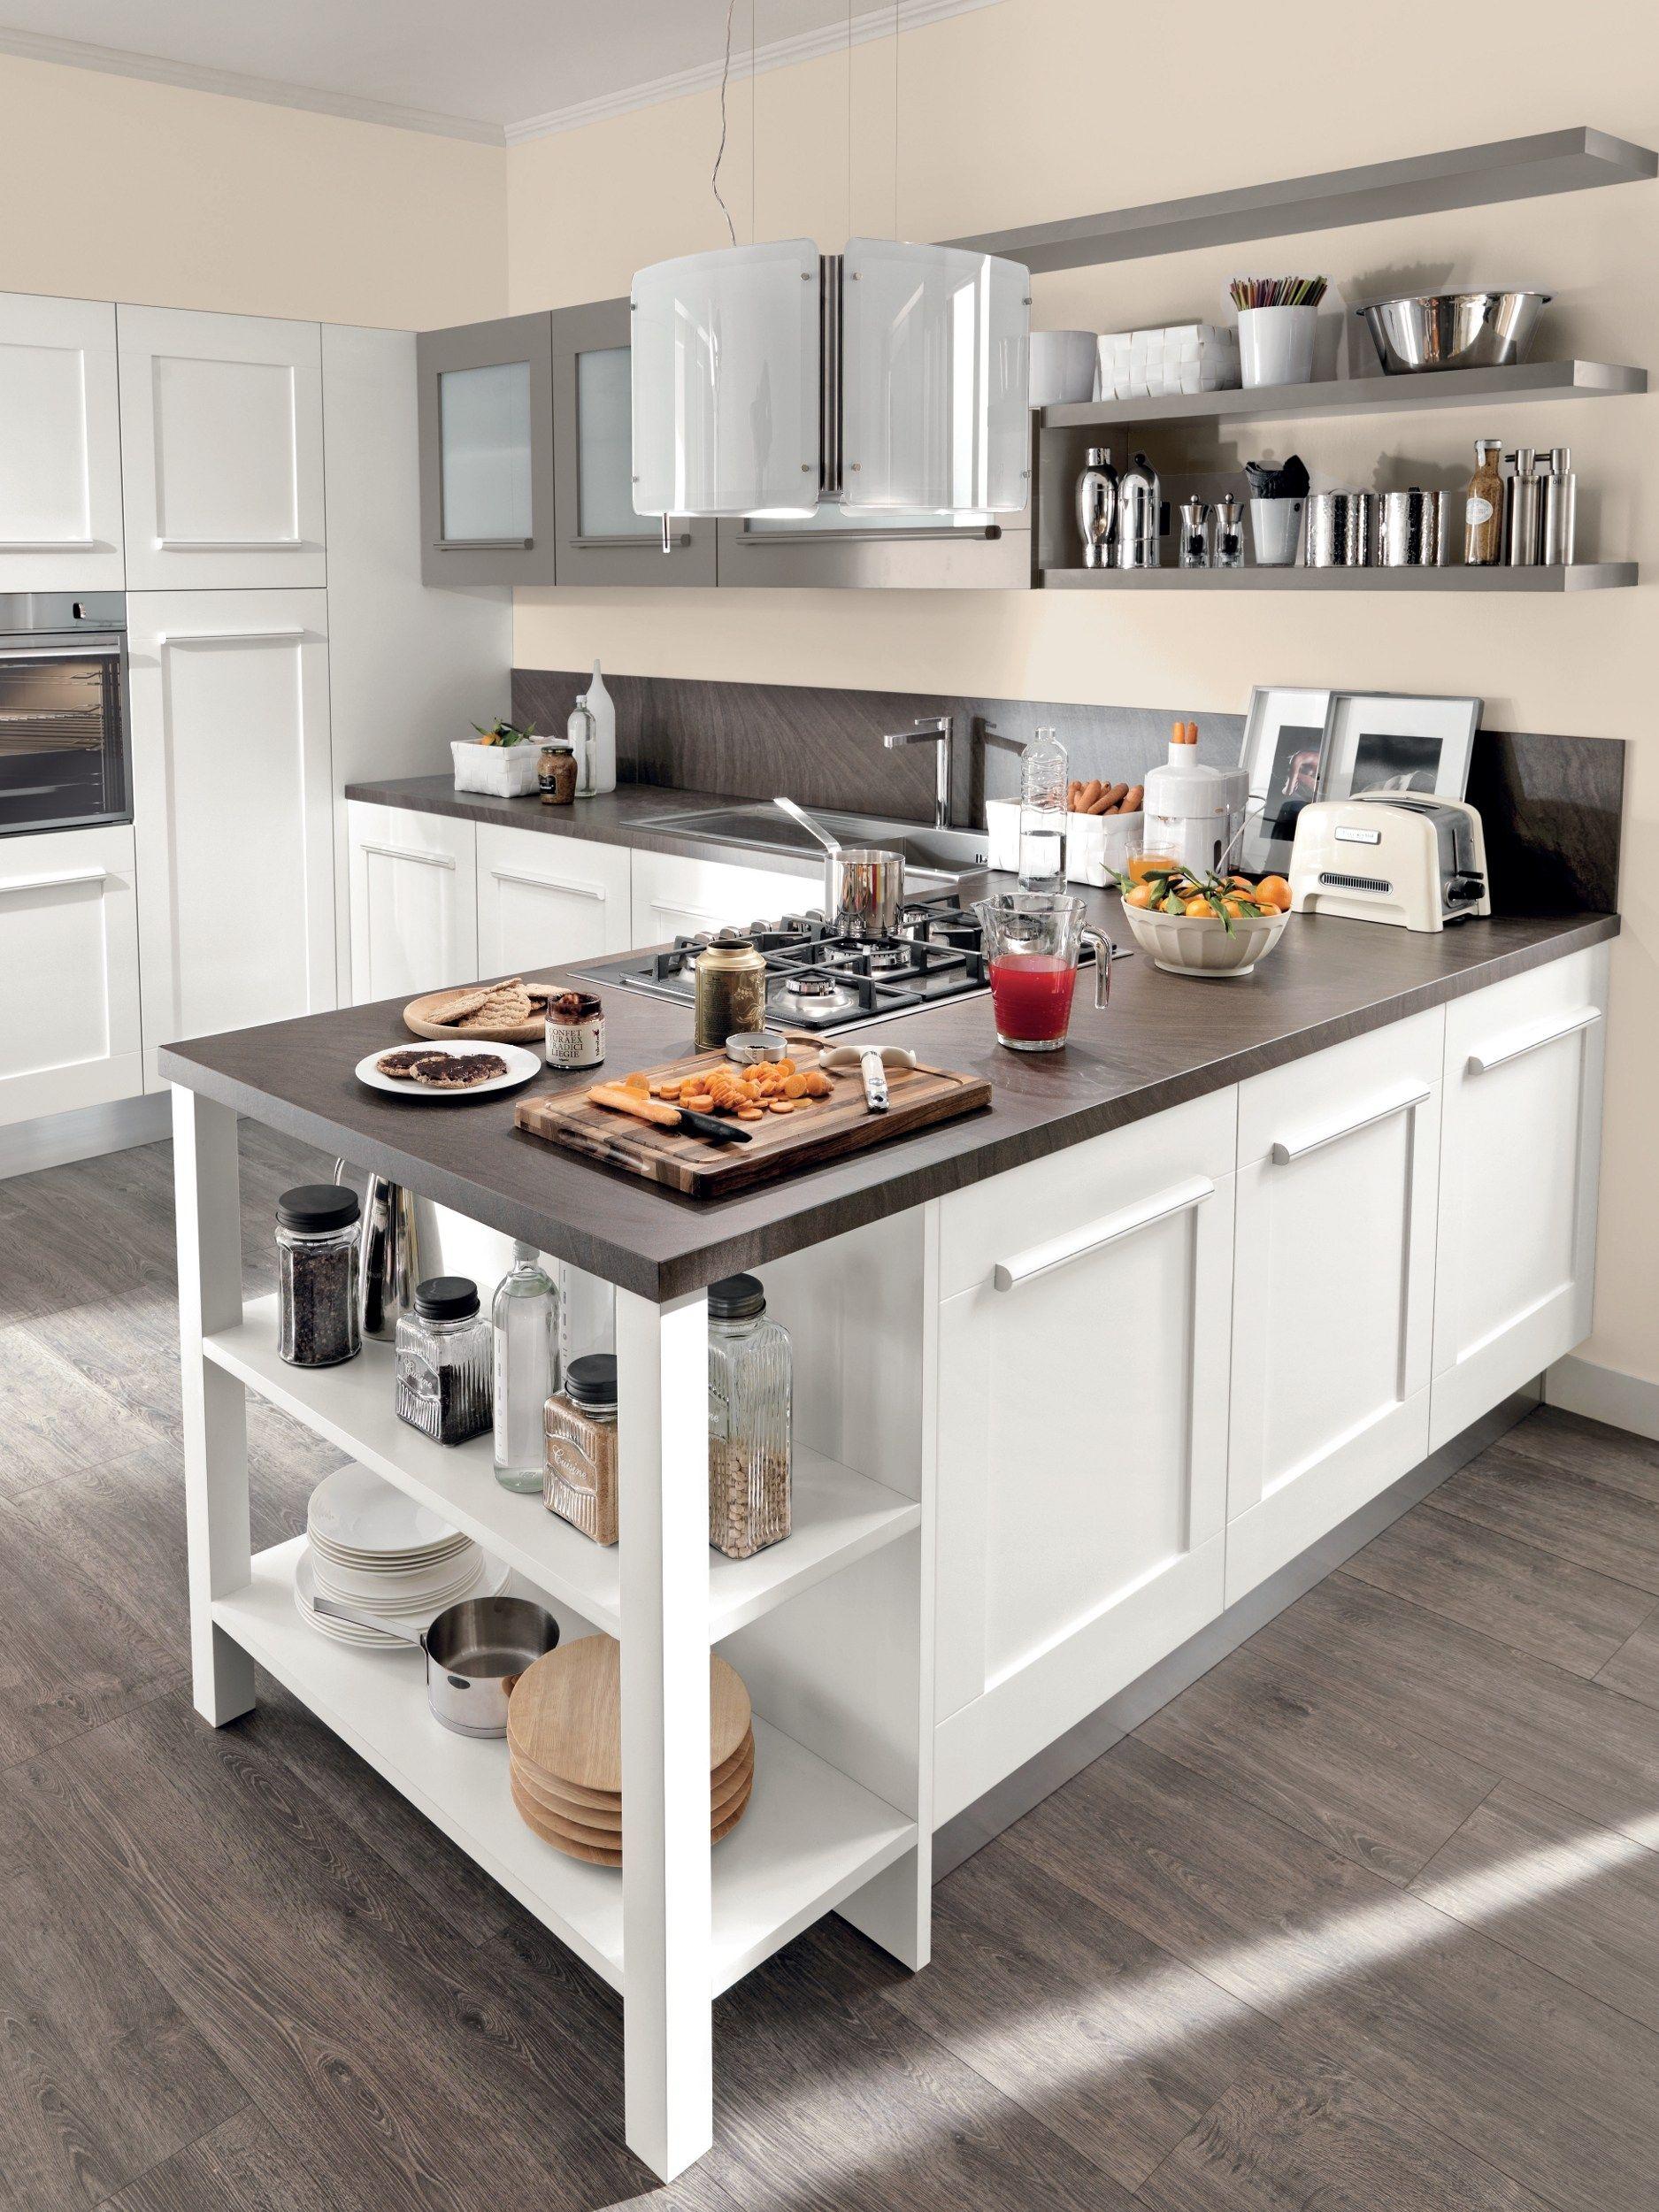 Gallery cucina con maniglie integrate by cucine lube for Maniglie cucina lube